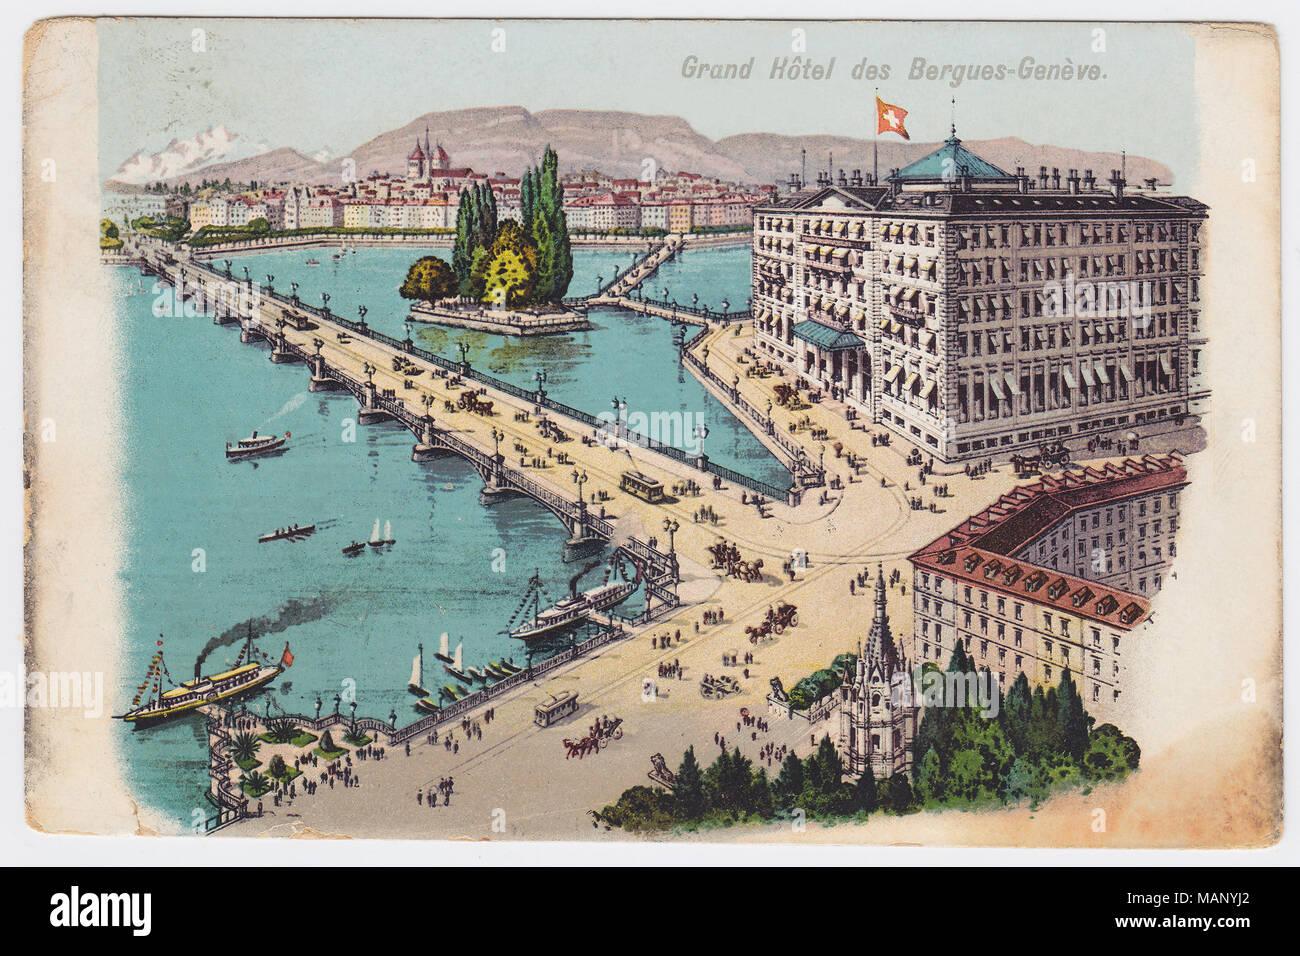 Hôtel des Bergues, Geneva - Stock Image